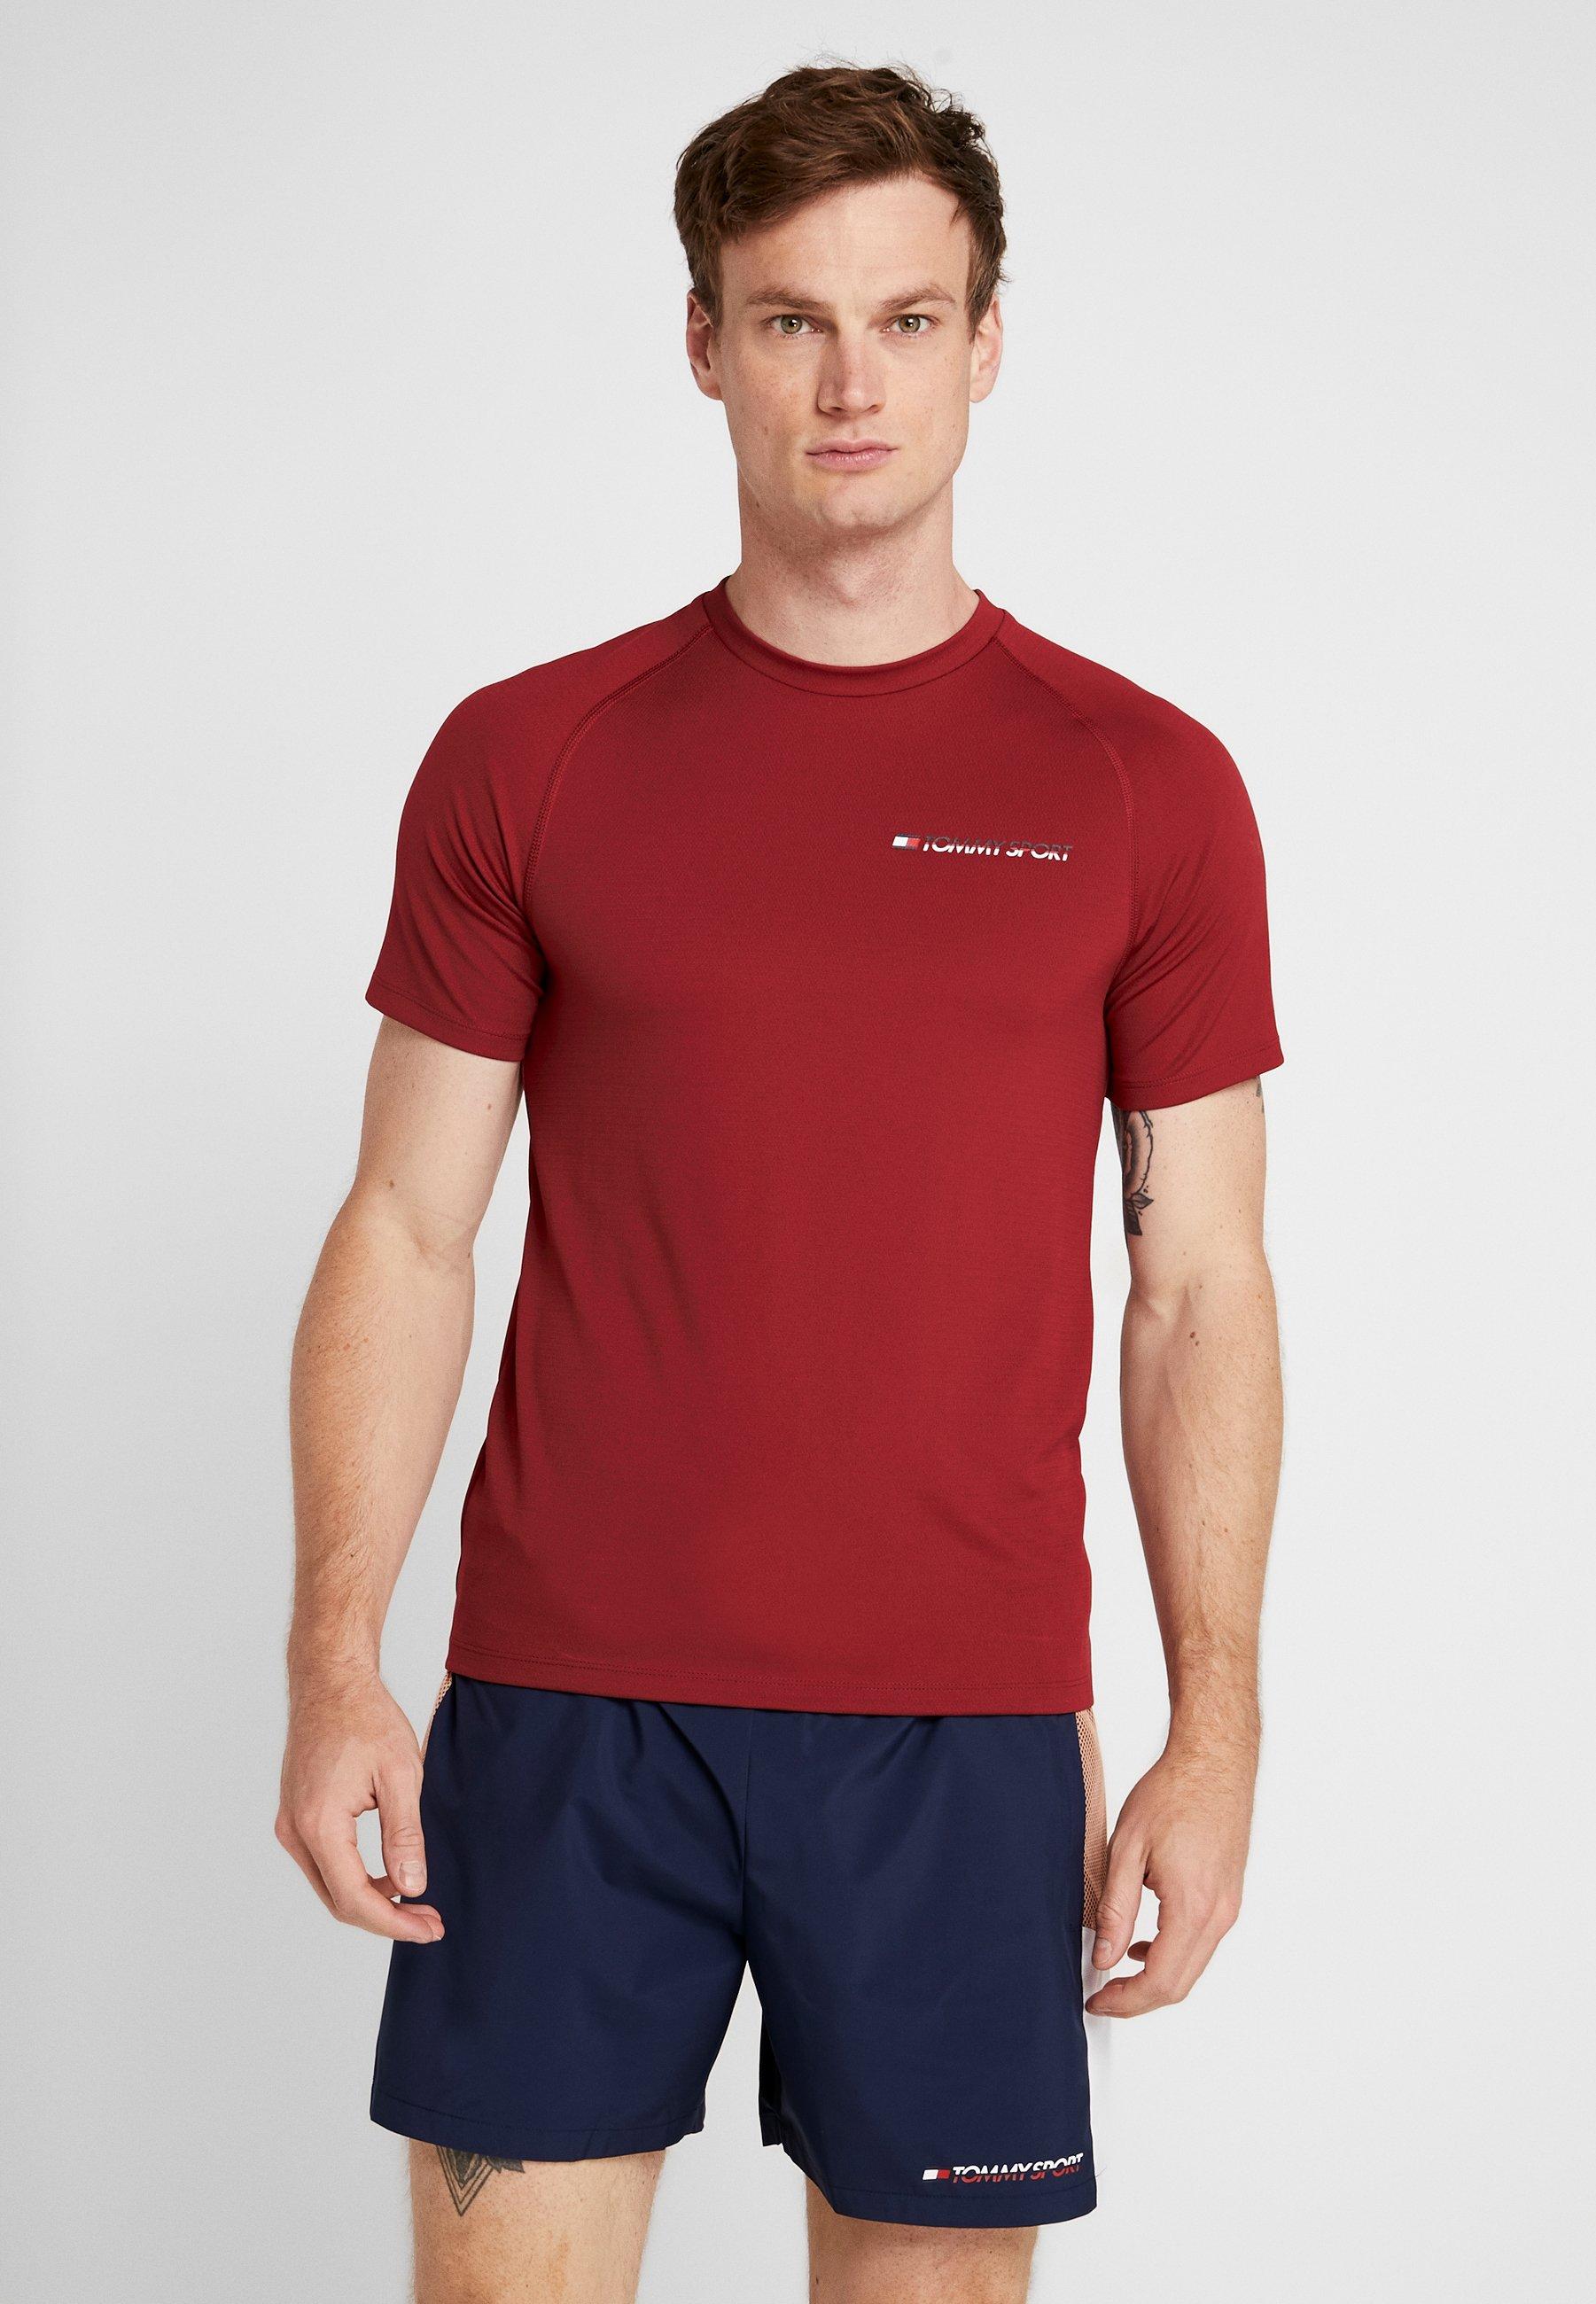 PerformanceT Tommy shirt Sport Red Basique Biking 0wknOP